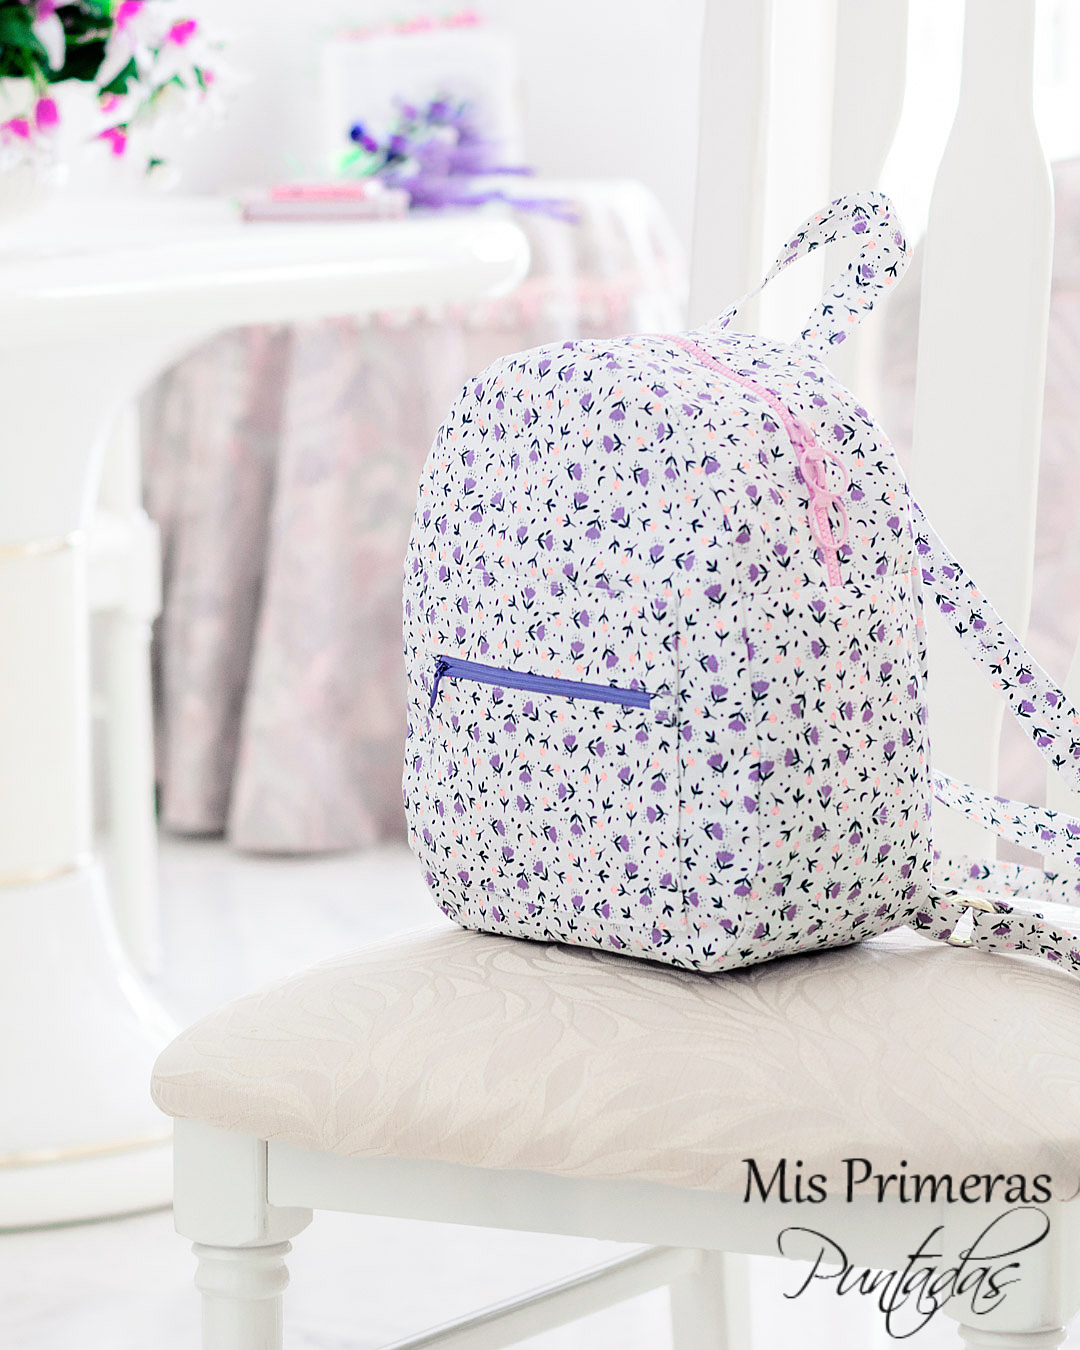 Mis Primeras Puntadas - Blog de Costura: Mochila Katia Fabrics